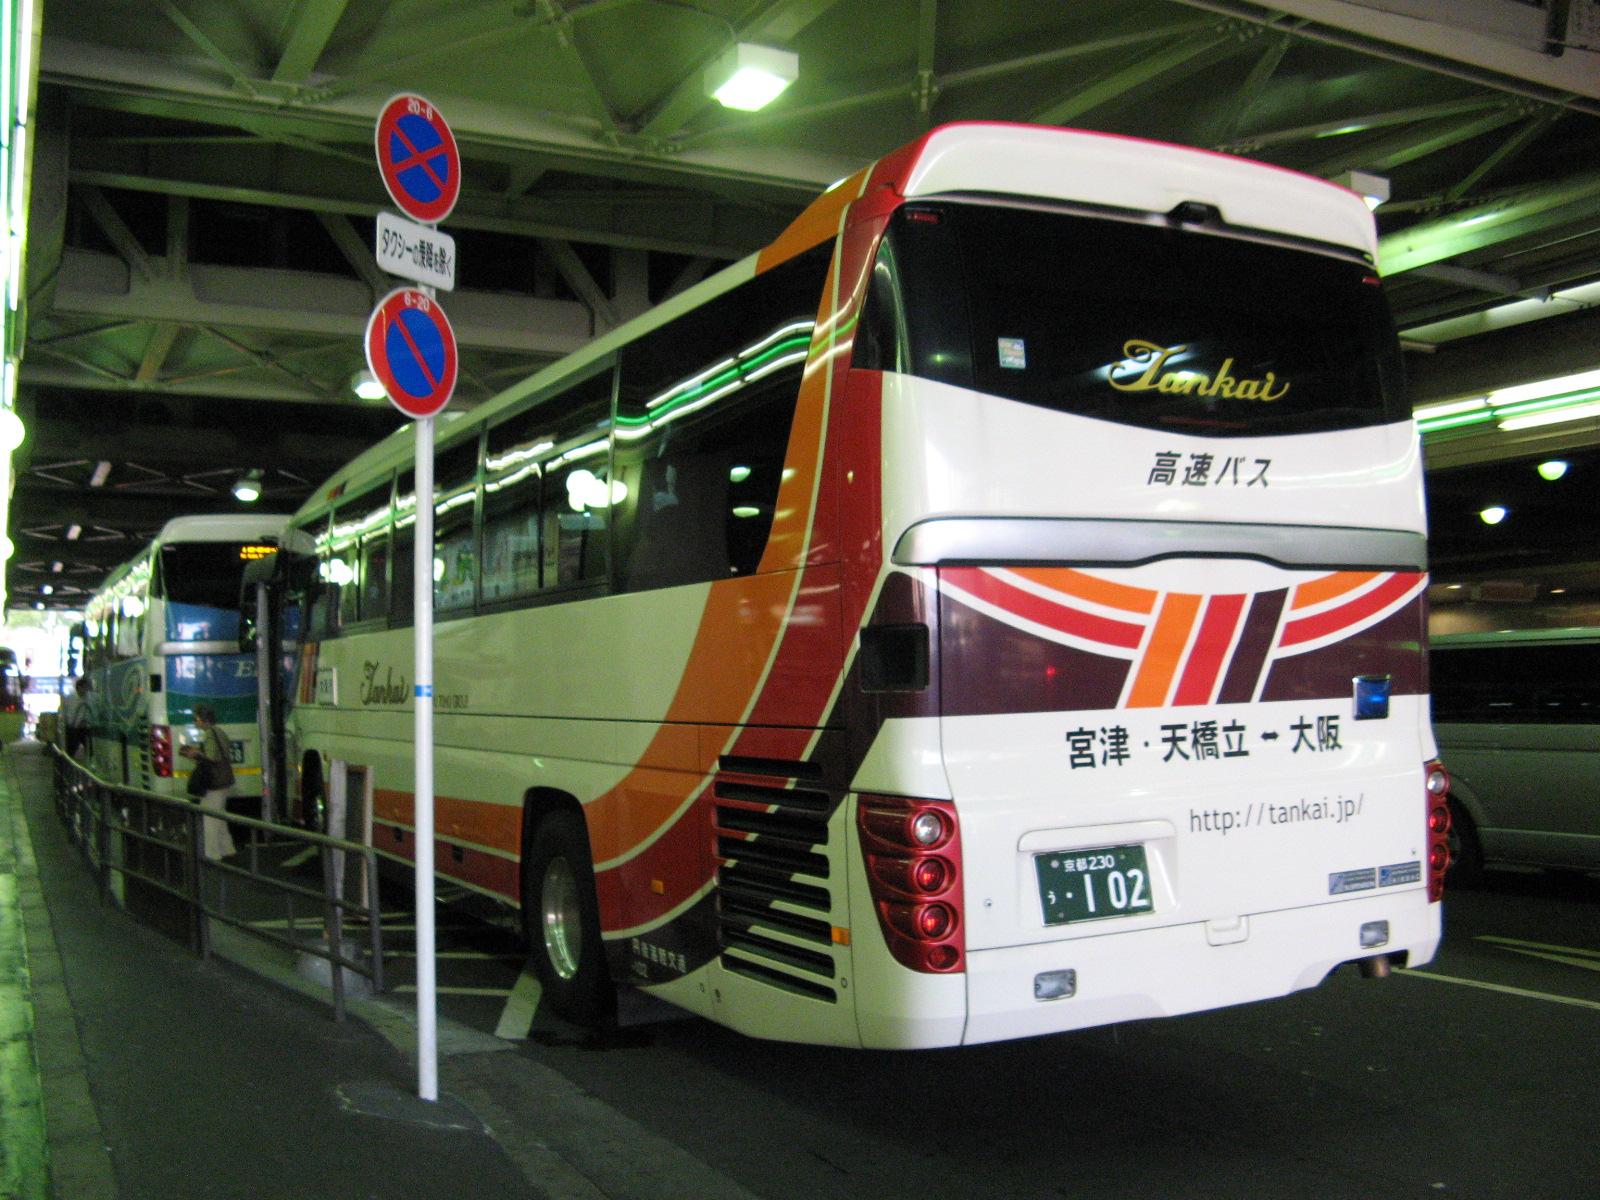 バス 大阪 天橋立